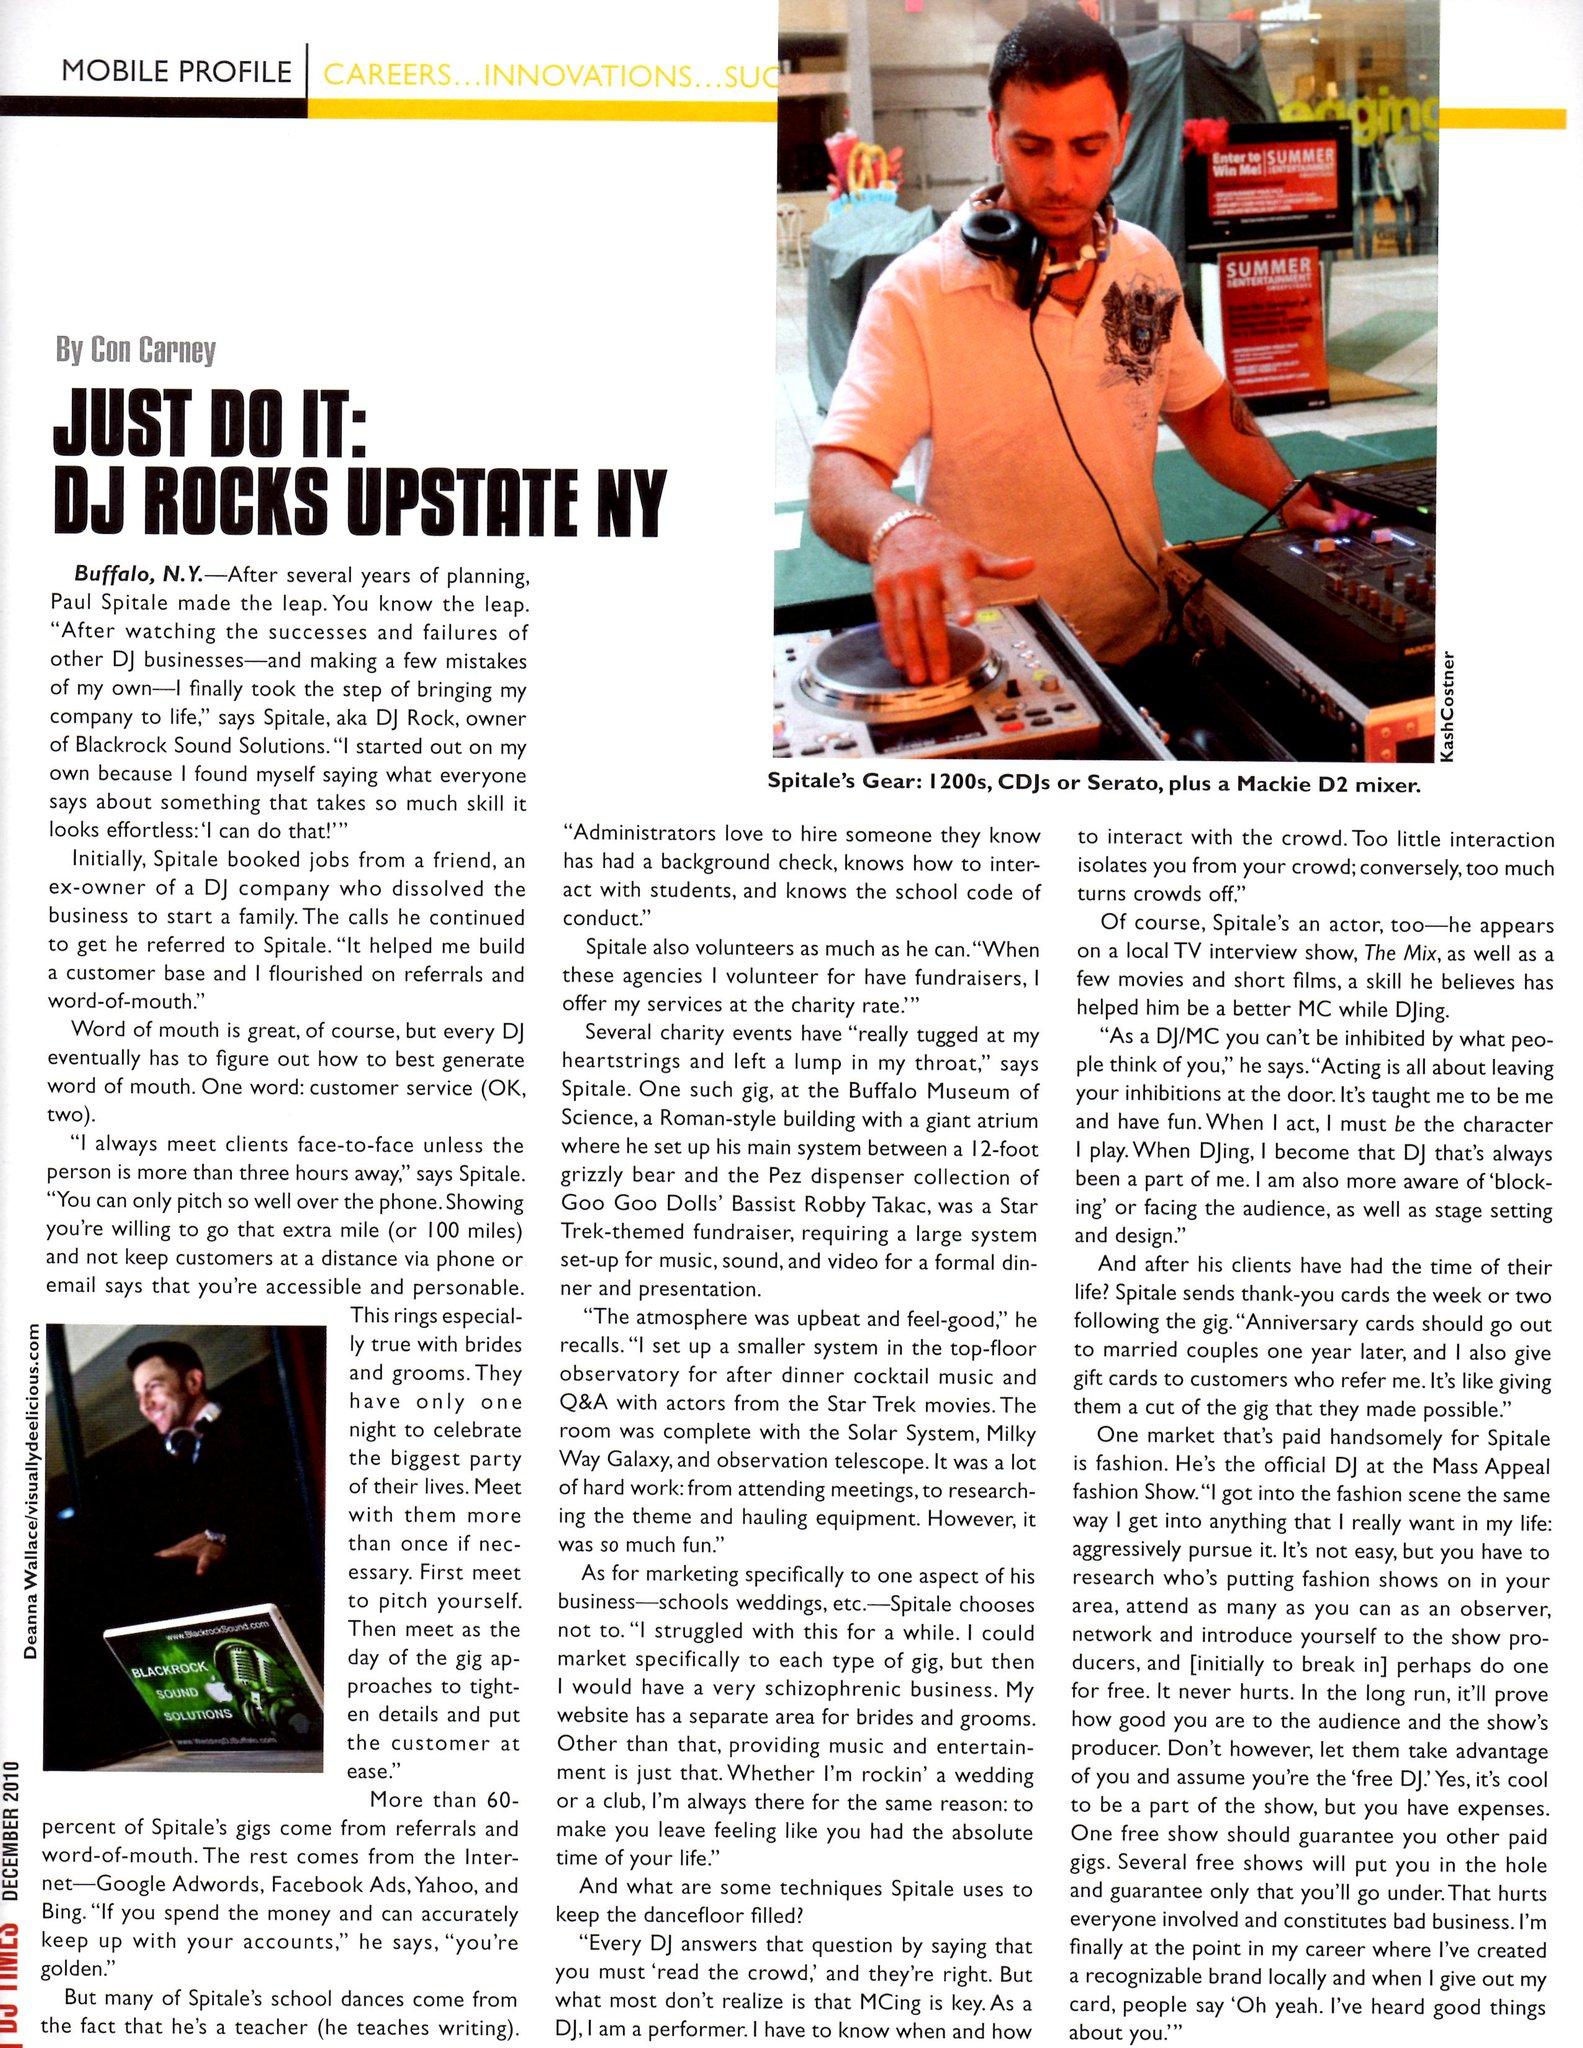 DJ Times Magazine Interview